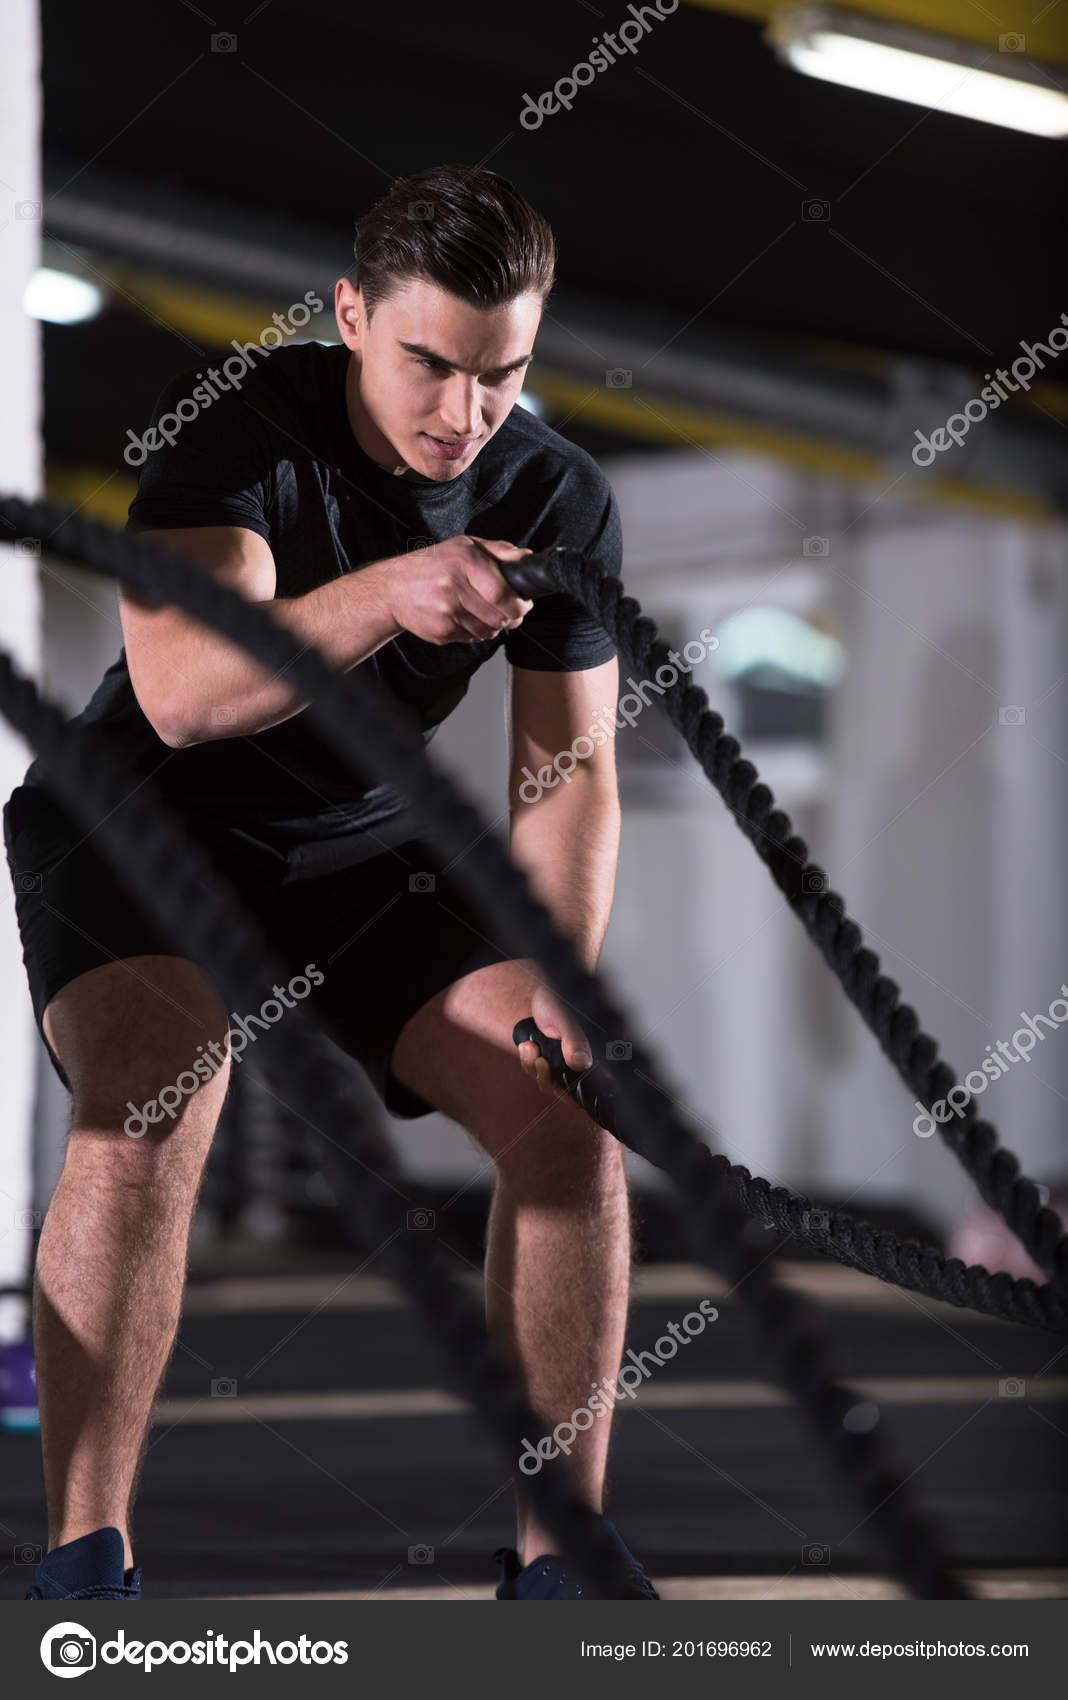 Junge Sportler Fit Mann Funktionstraining Fitnessraum Tun Kampf ...